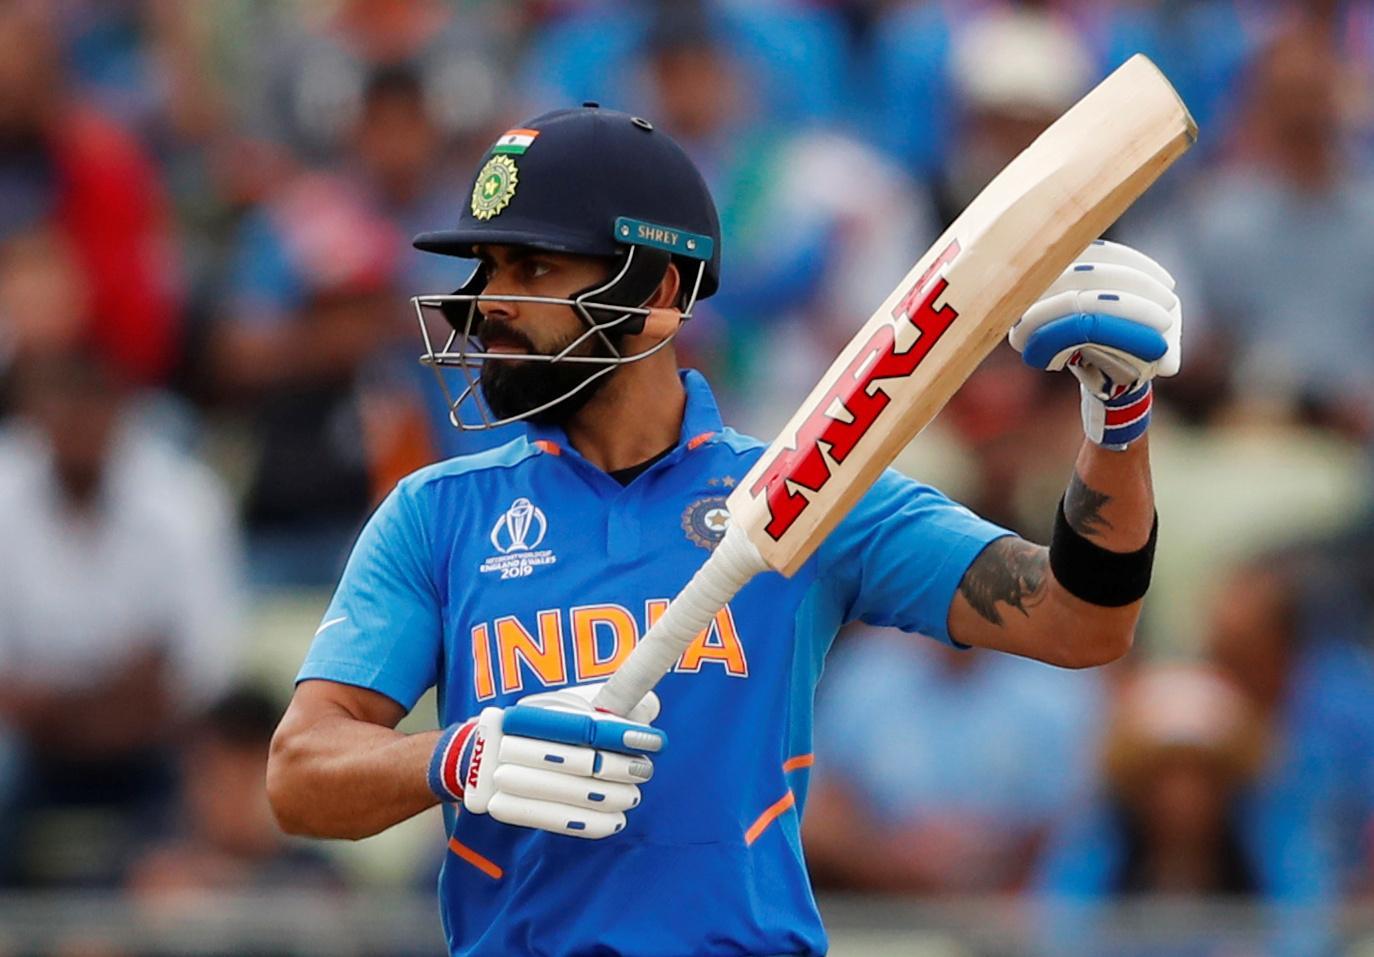 India's Kohli would rather finish than entertain